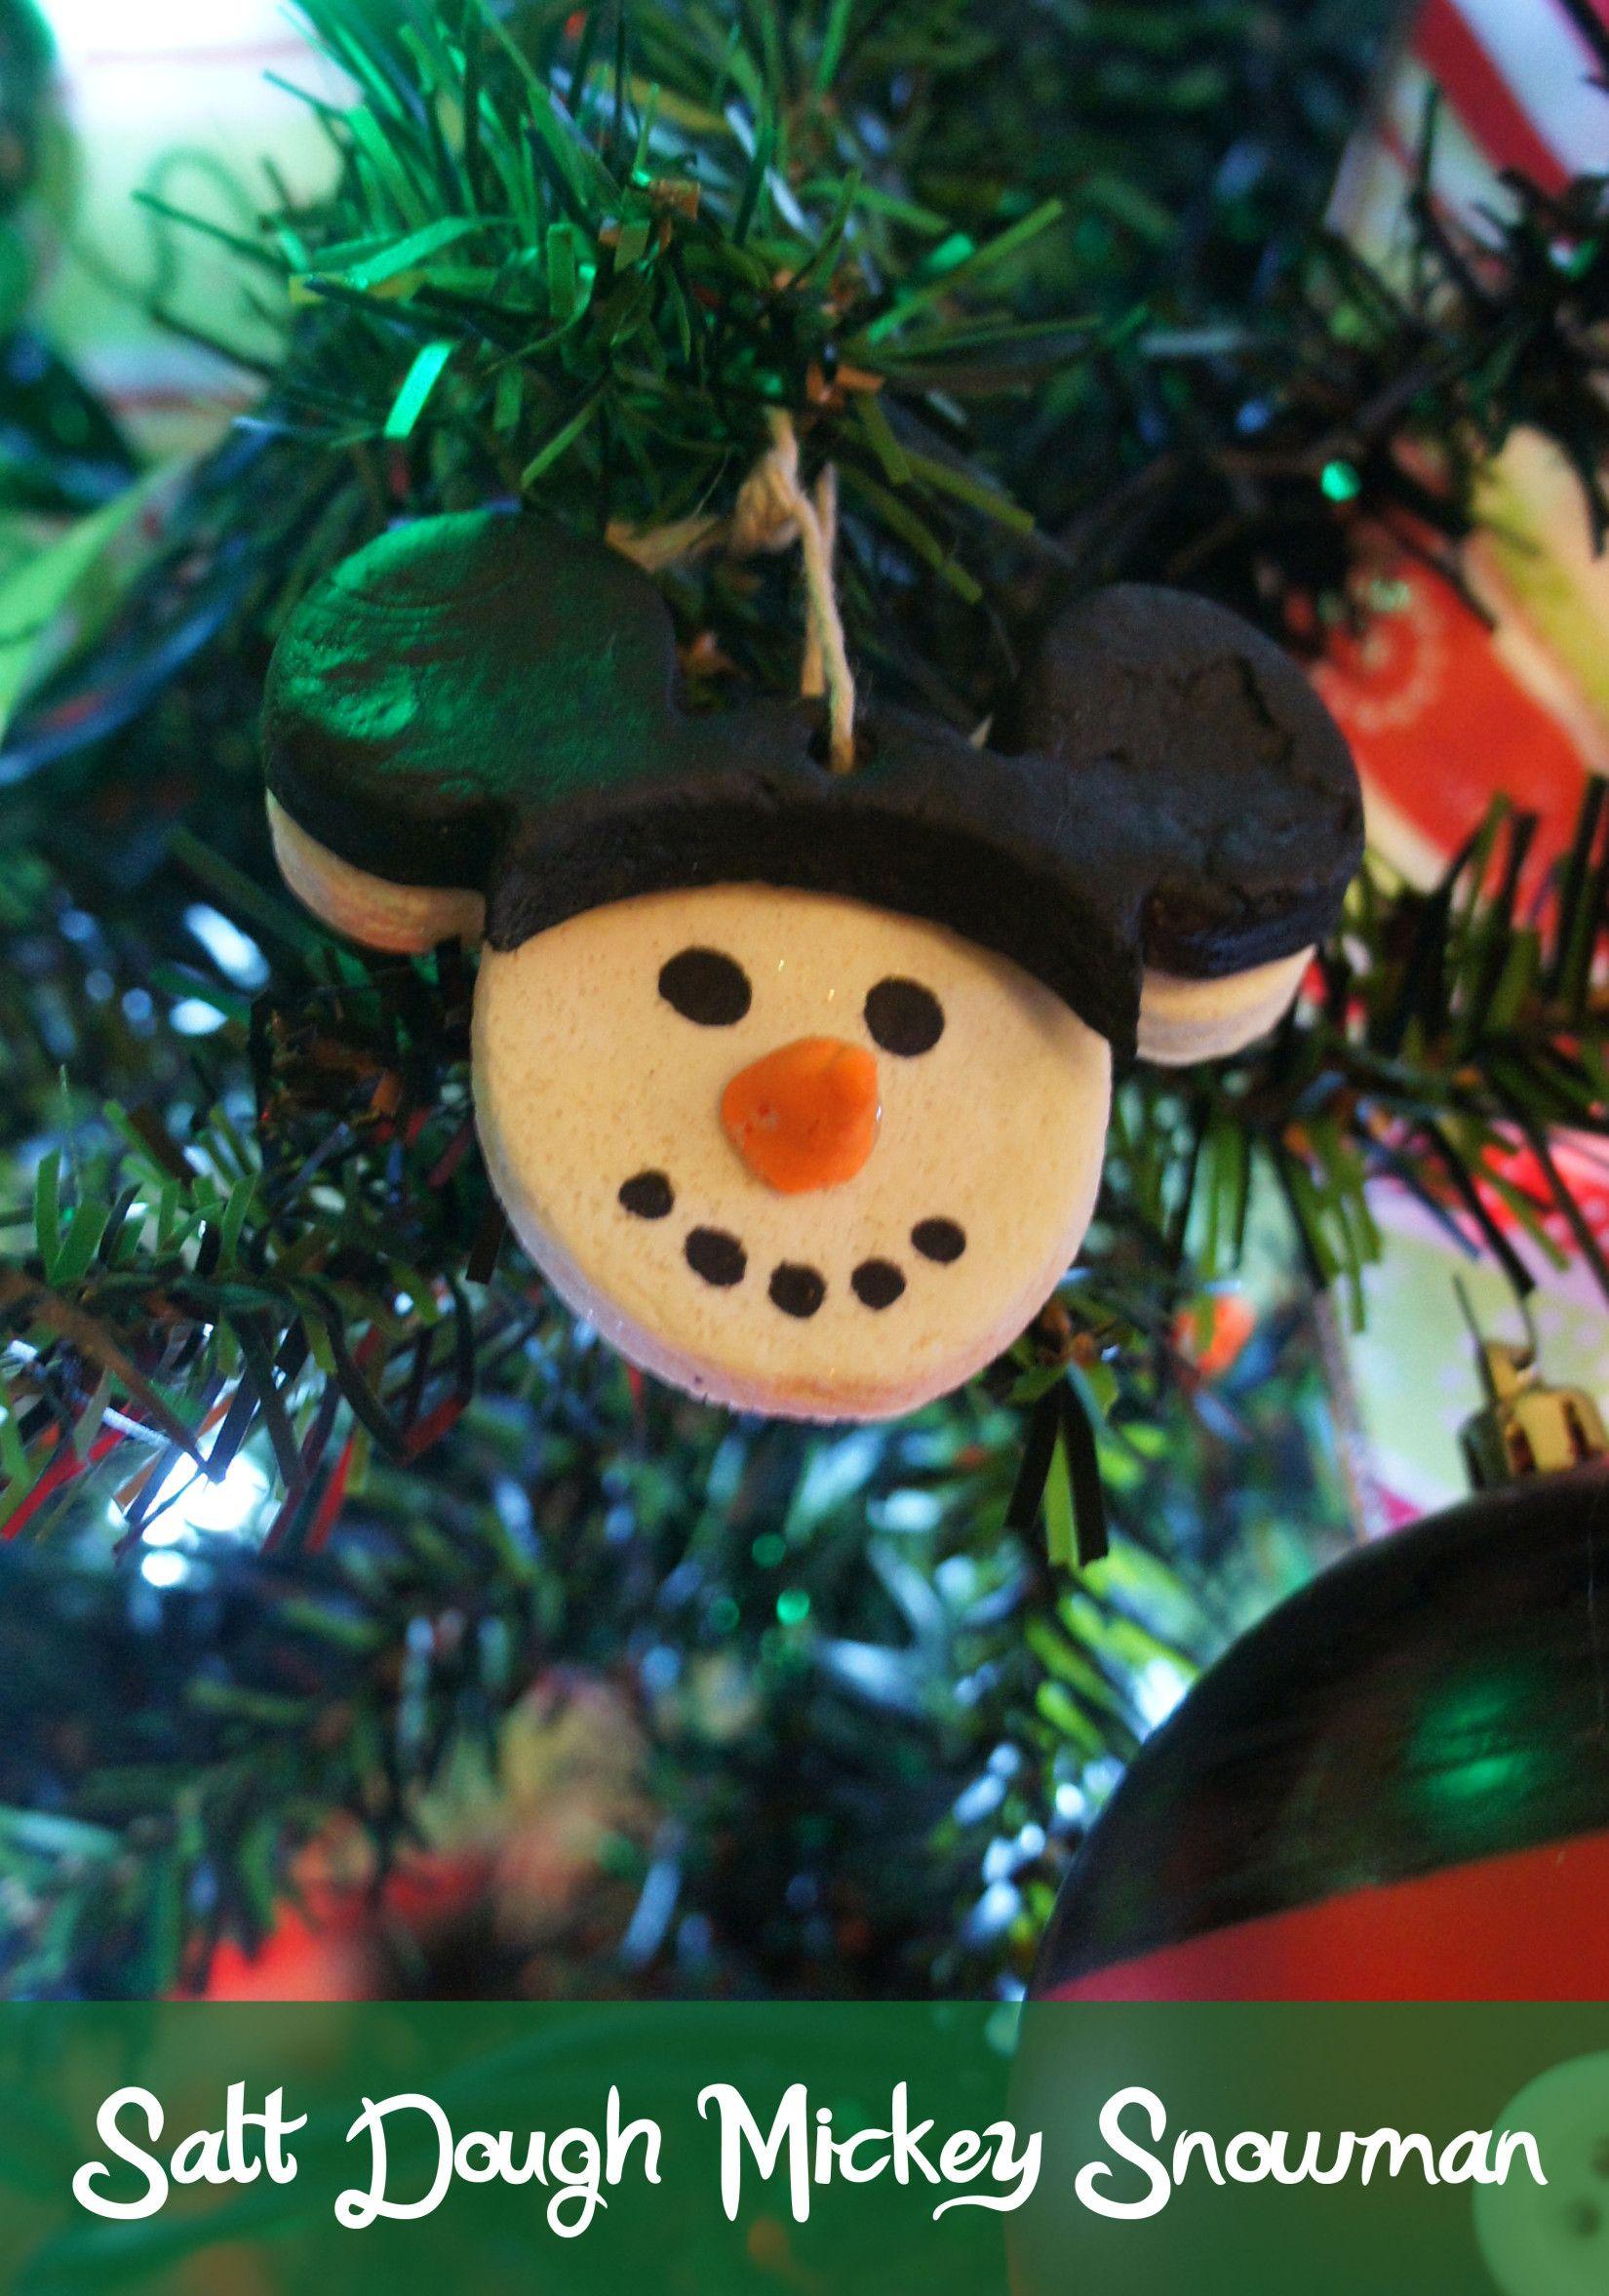 Salt Dough Mickey Snowman Ornaments Homemade Christmas Ornaments Diy Felt Christmas Ornaments Disney Christmas Ornaments